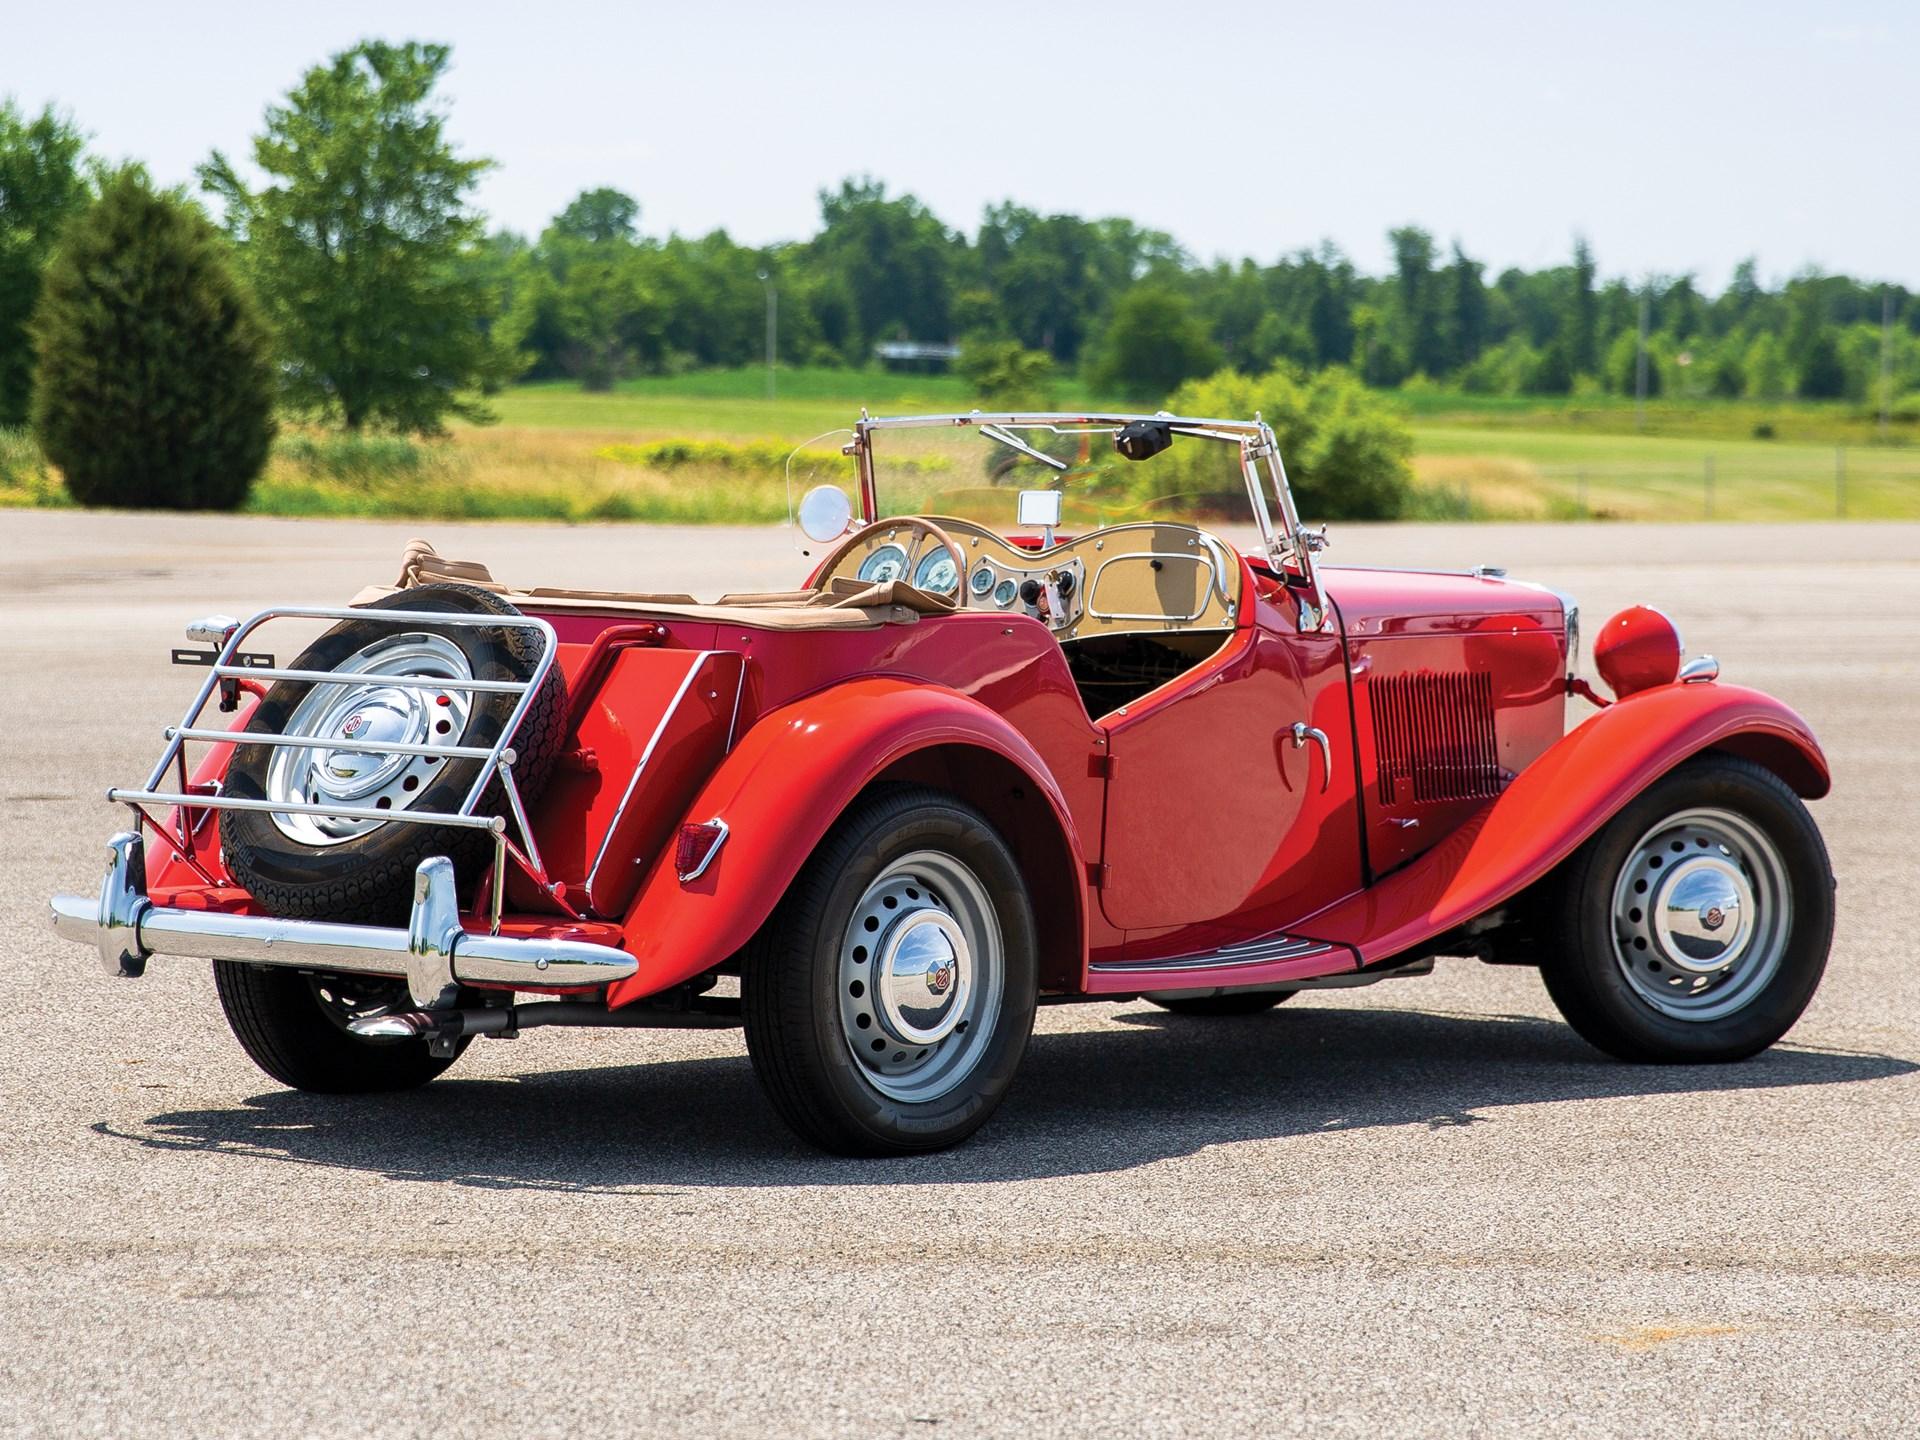 1952 MG TD 3/4 rear